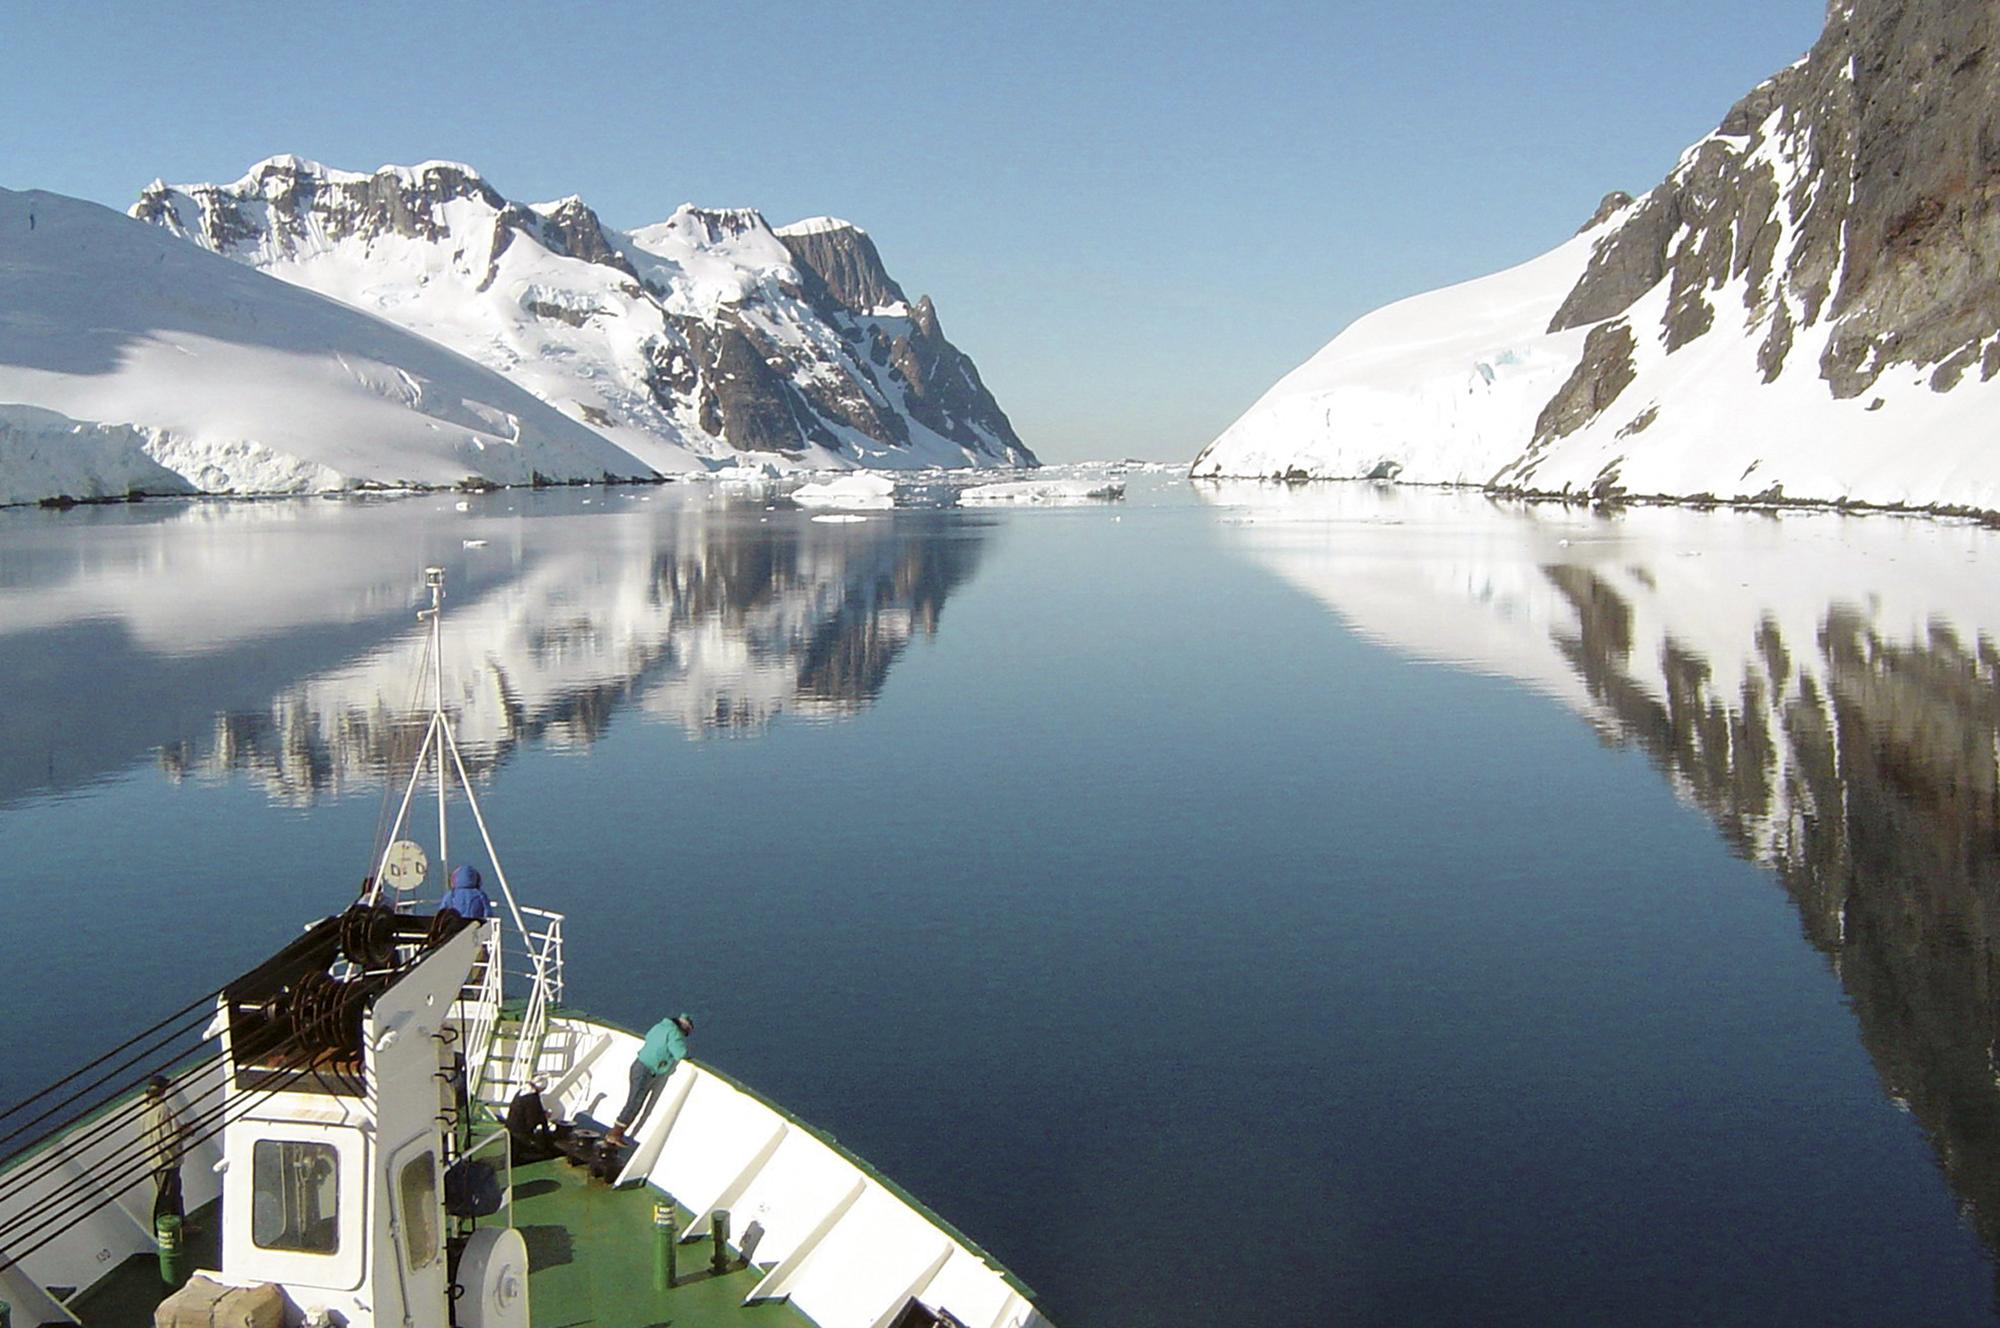 MS ISLAND SKY - Antarktische Halbinsel - Über den Polarkreis